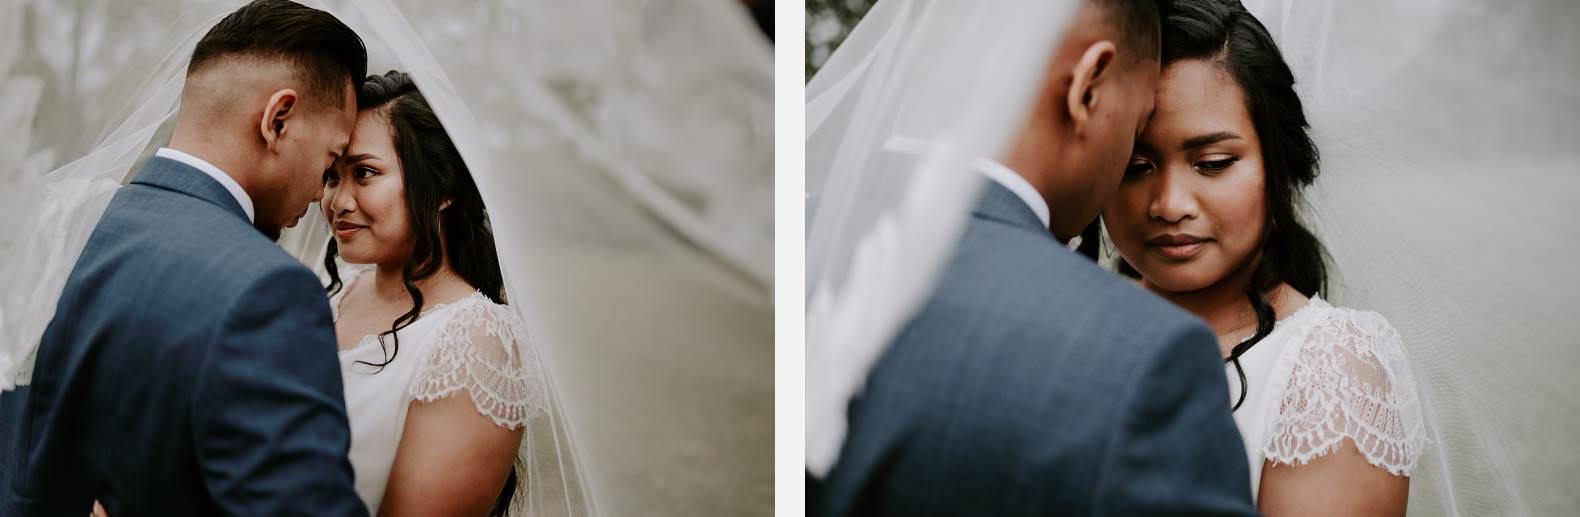 mariage manoir de corny photographe bel esprit 0057 1